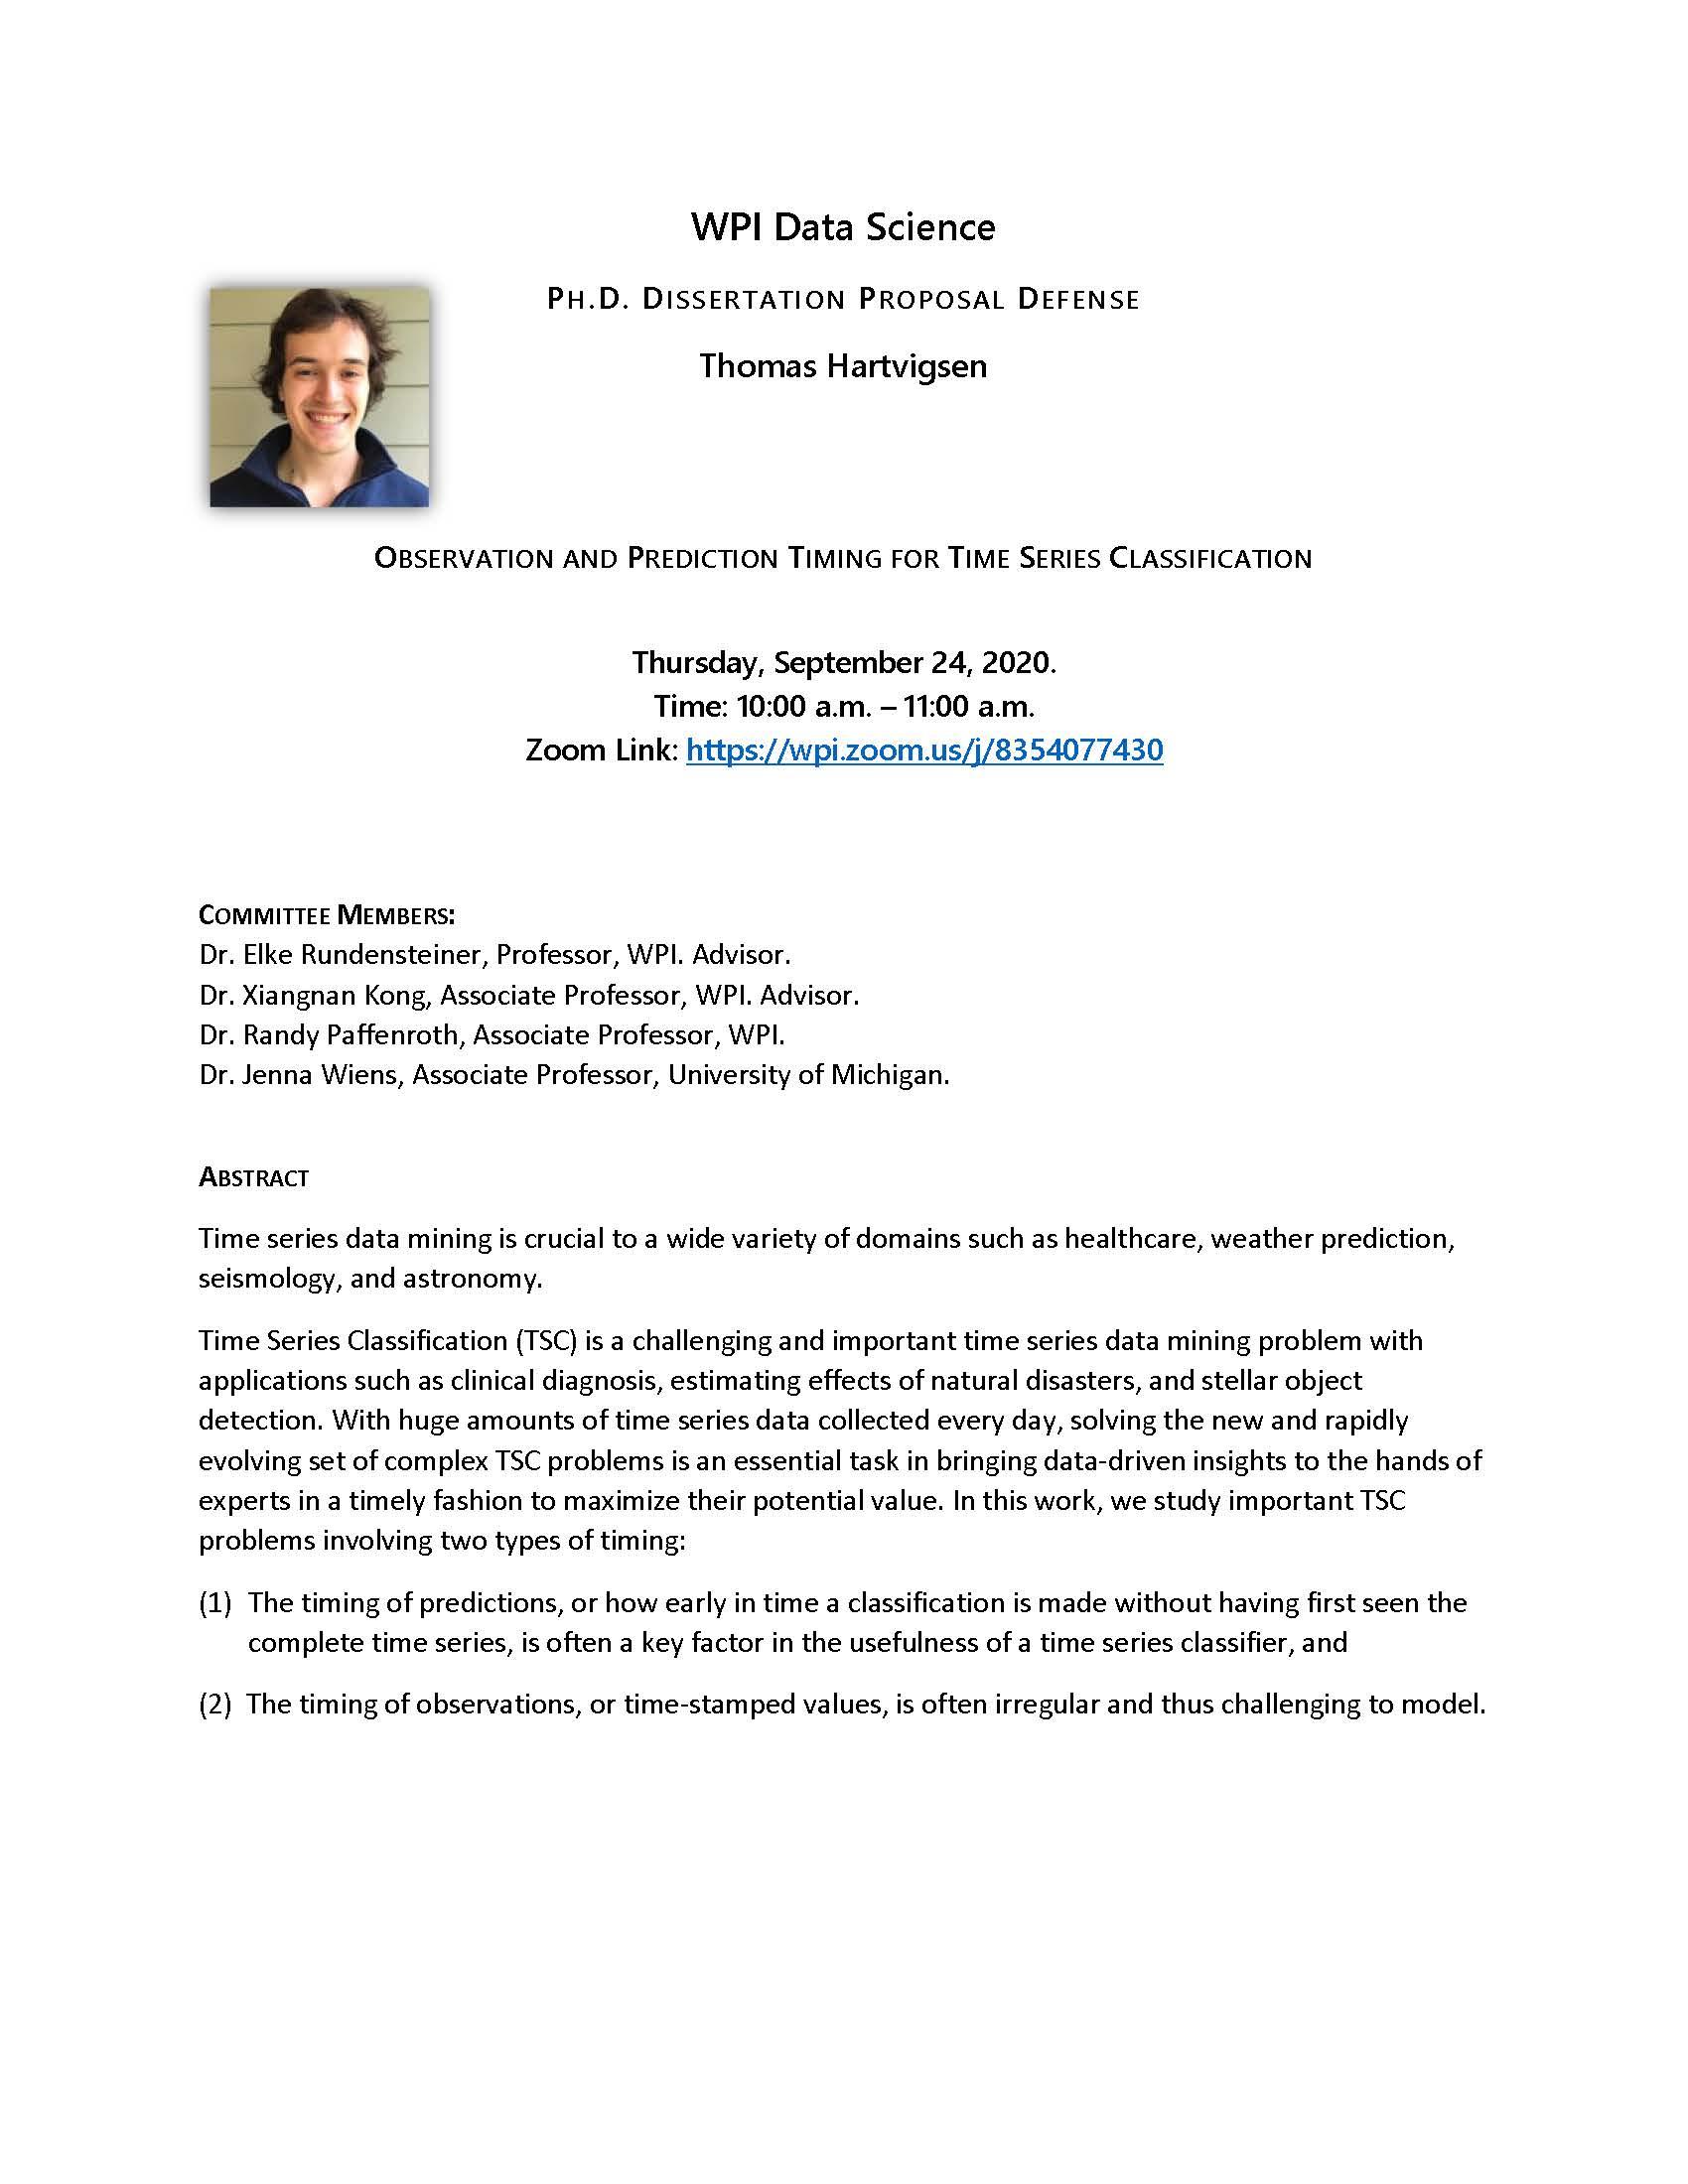 Tom Hartvigsen Ph.D. Dissertation Proposal Defense alt